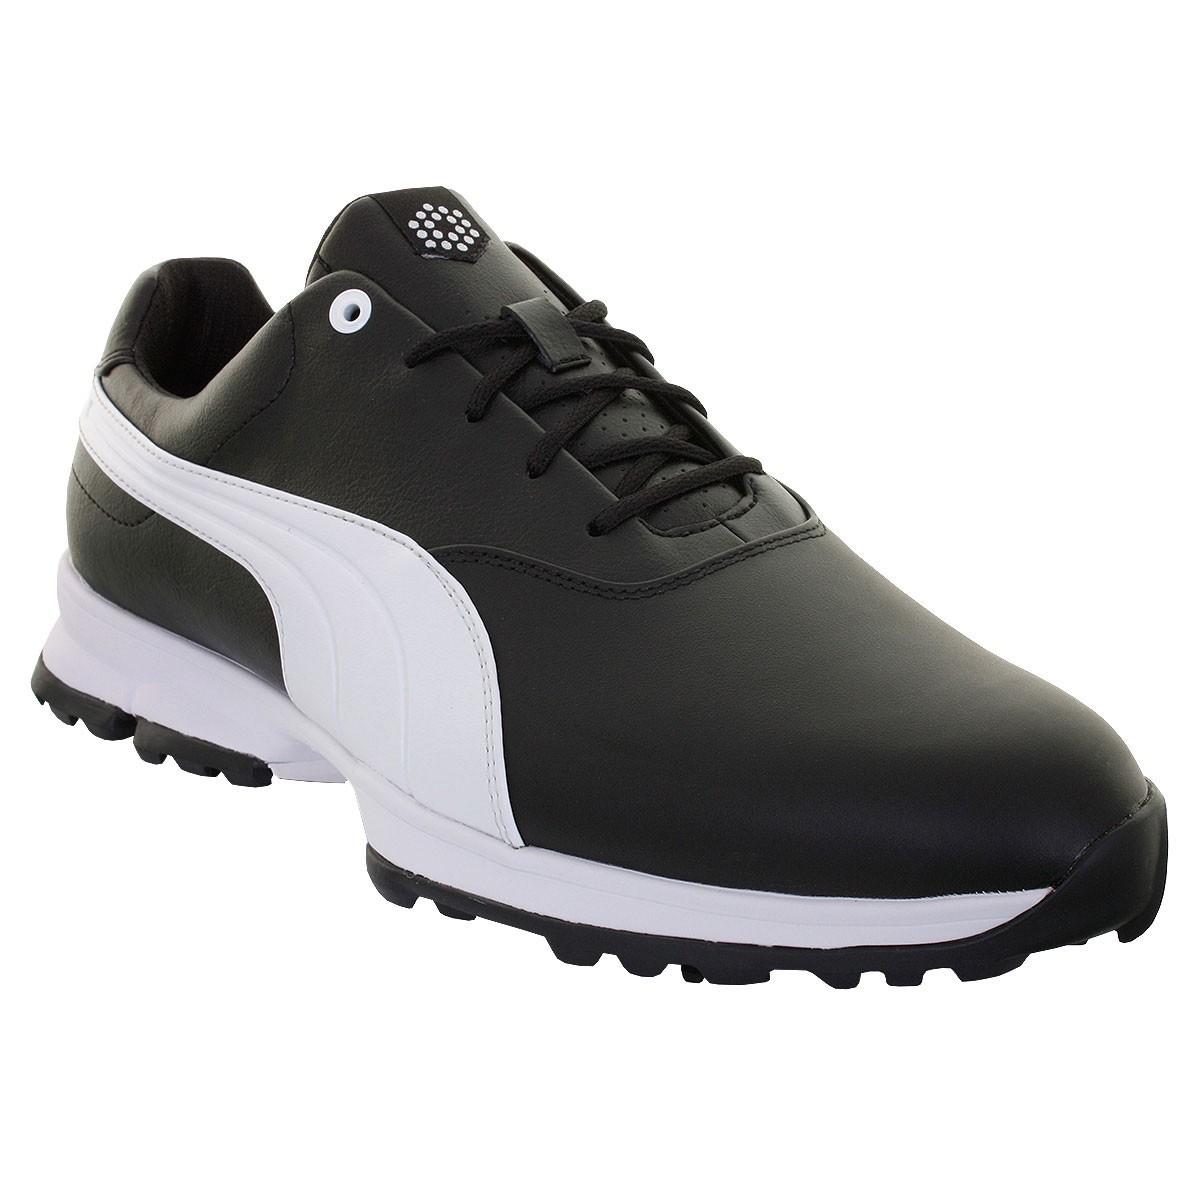 7807f7dc050 Puma Golf 2016 Mens Ace Waterproof Leather Upper Golf Shoes 188658 ...